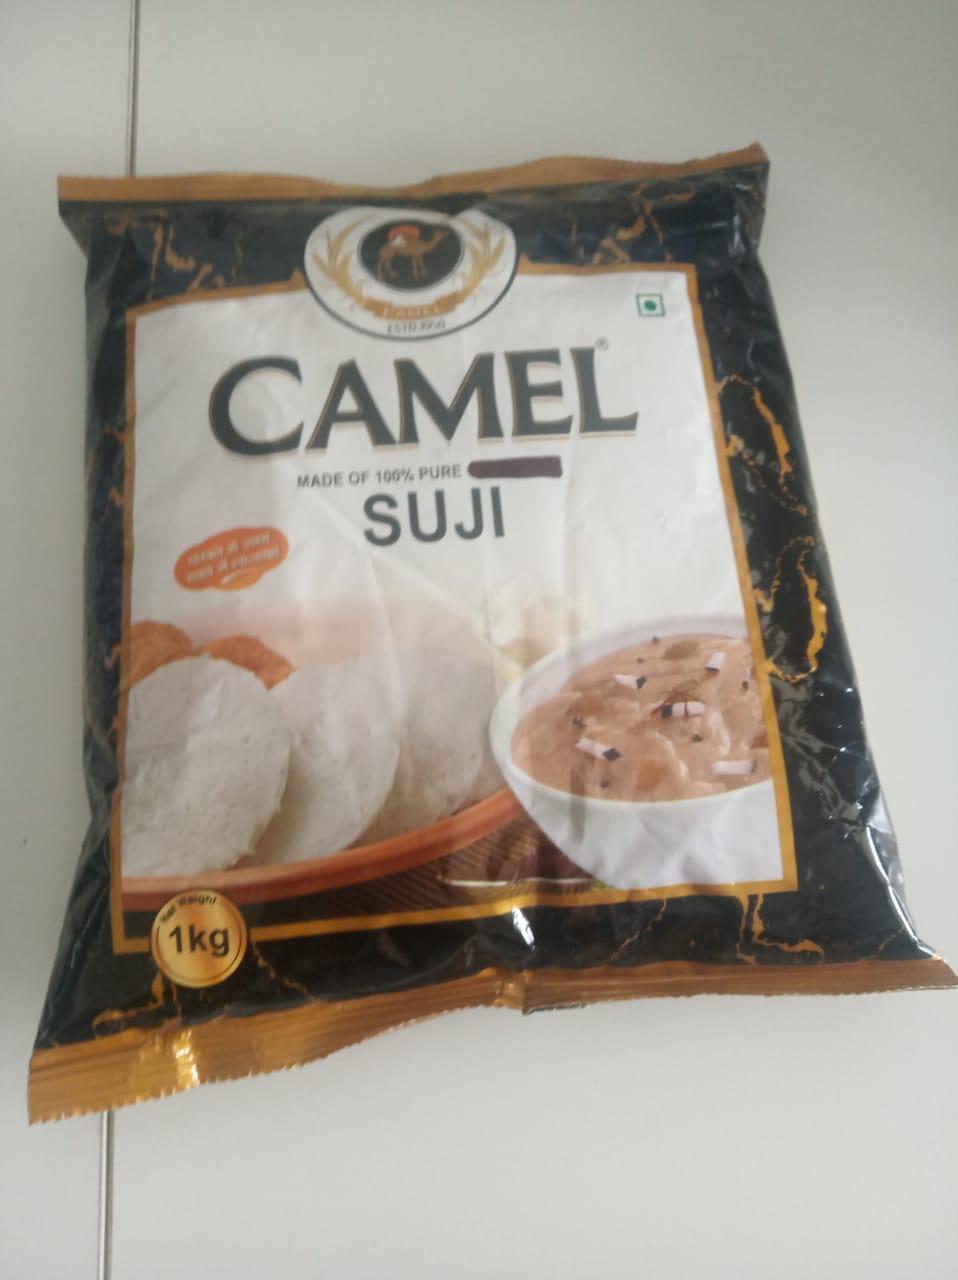 Camel Suji / Sooji